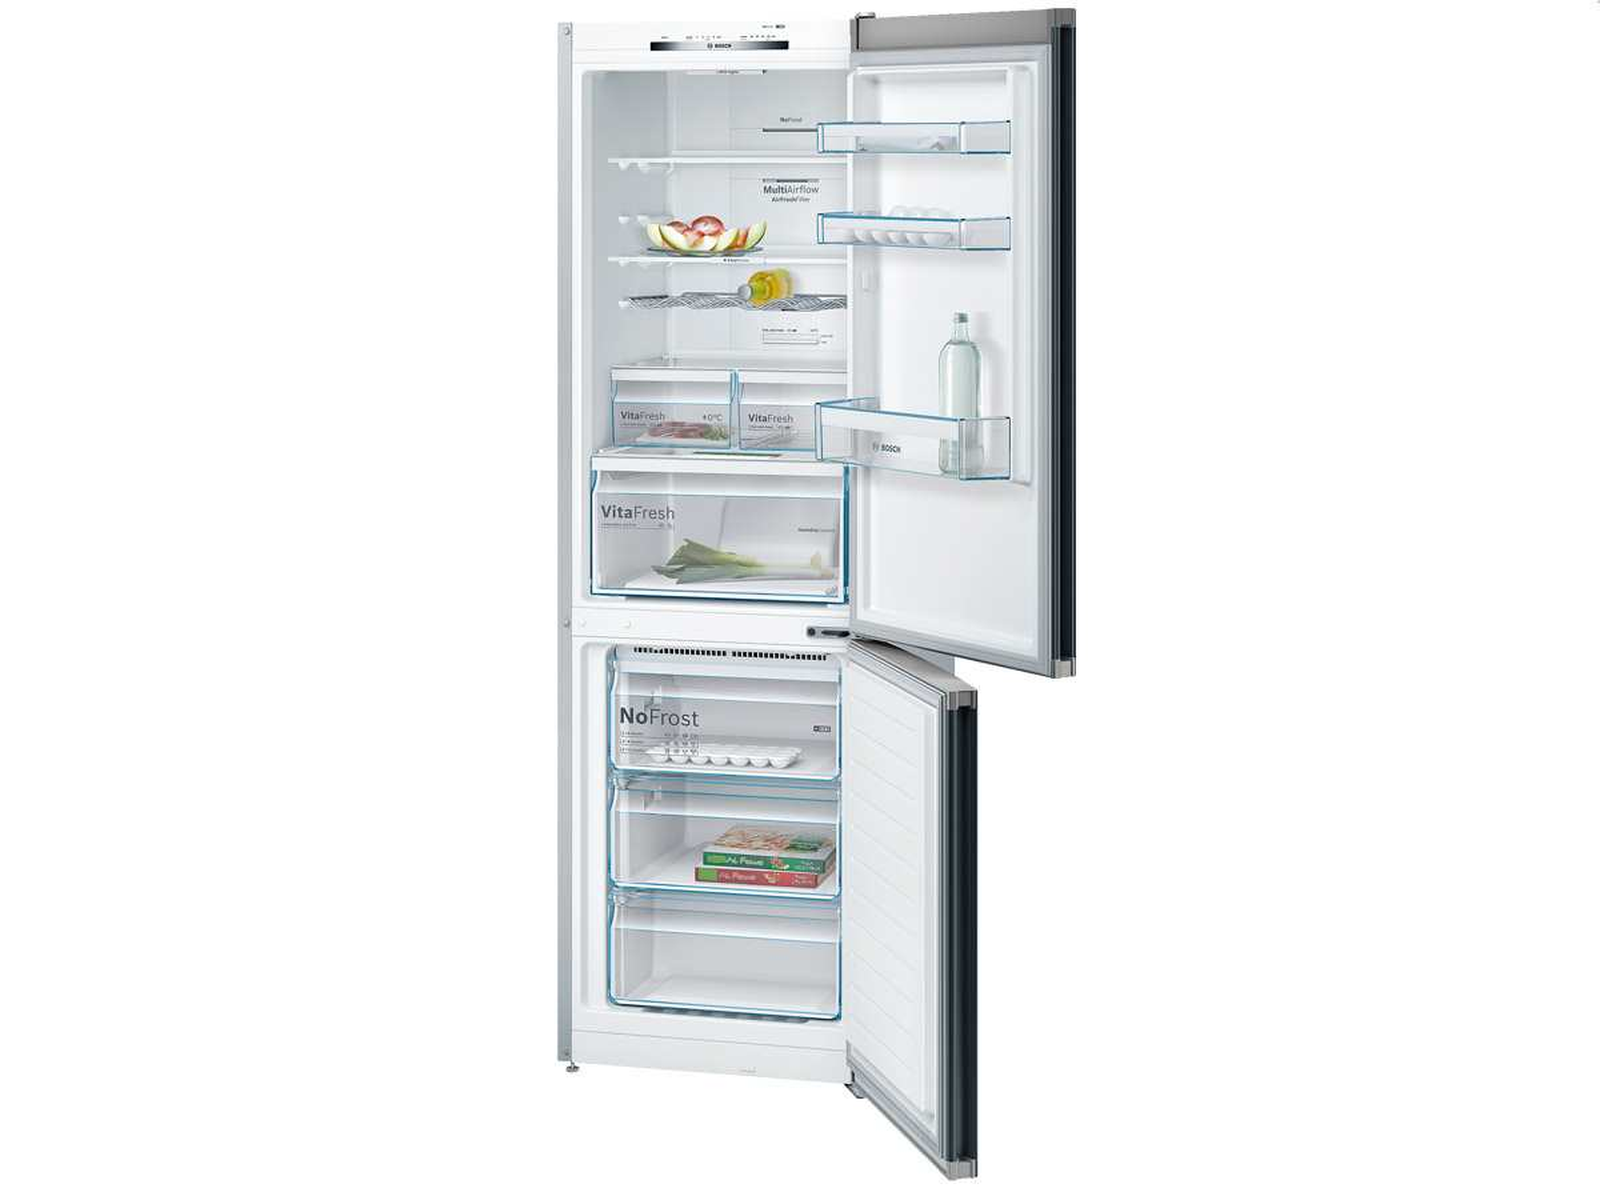 Bosch Kühlschrank Kgn 33 48 : Bosch kgn vb kühl gefrierkombination schwarz